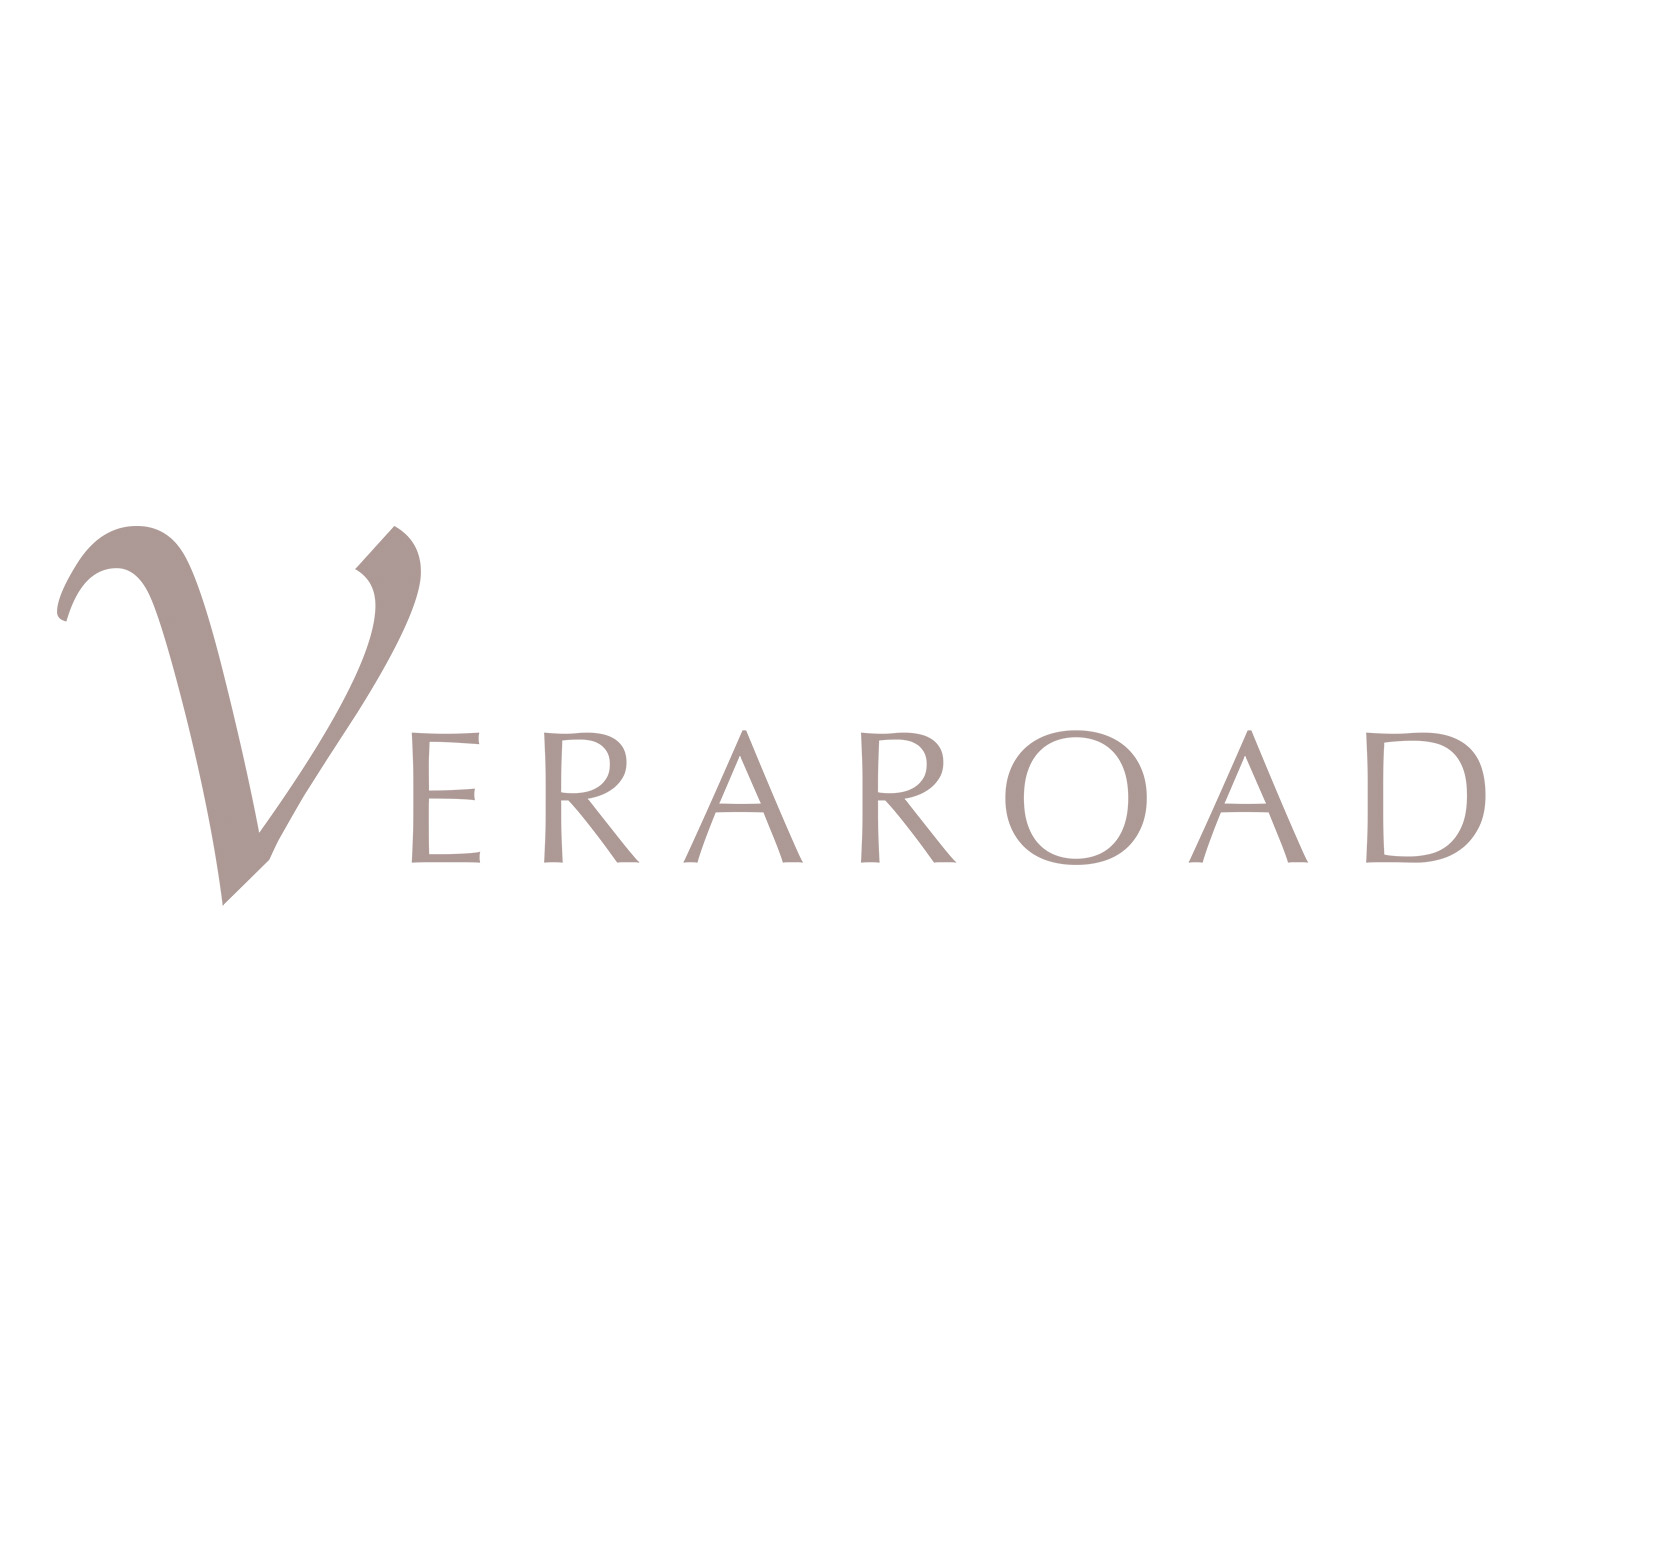 VeraRoad